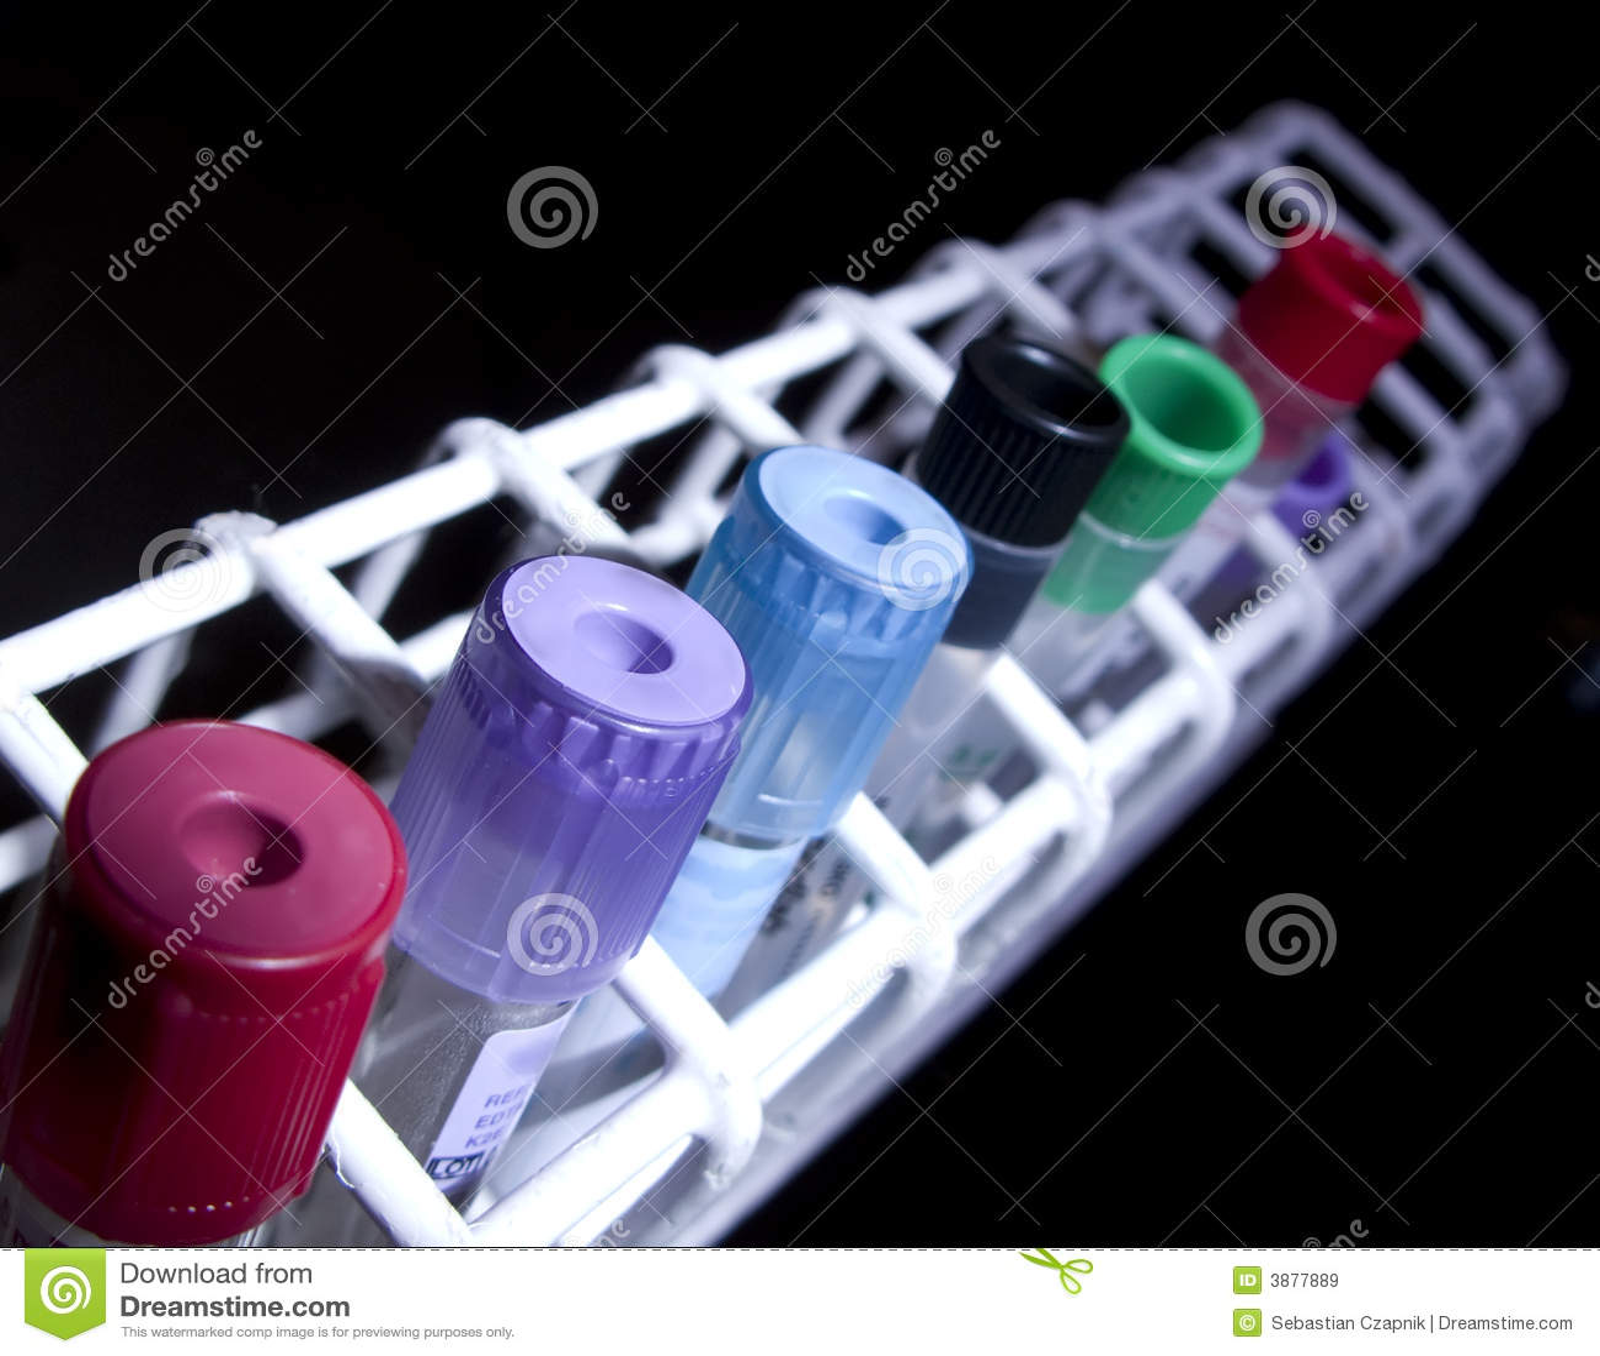 Laboratory samples